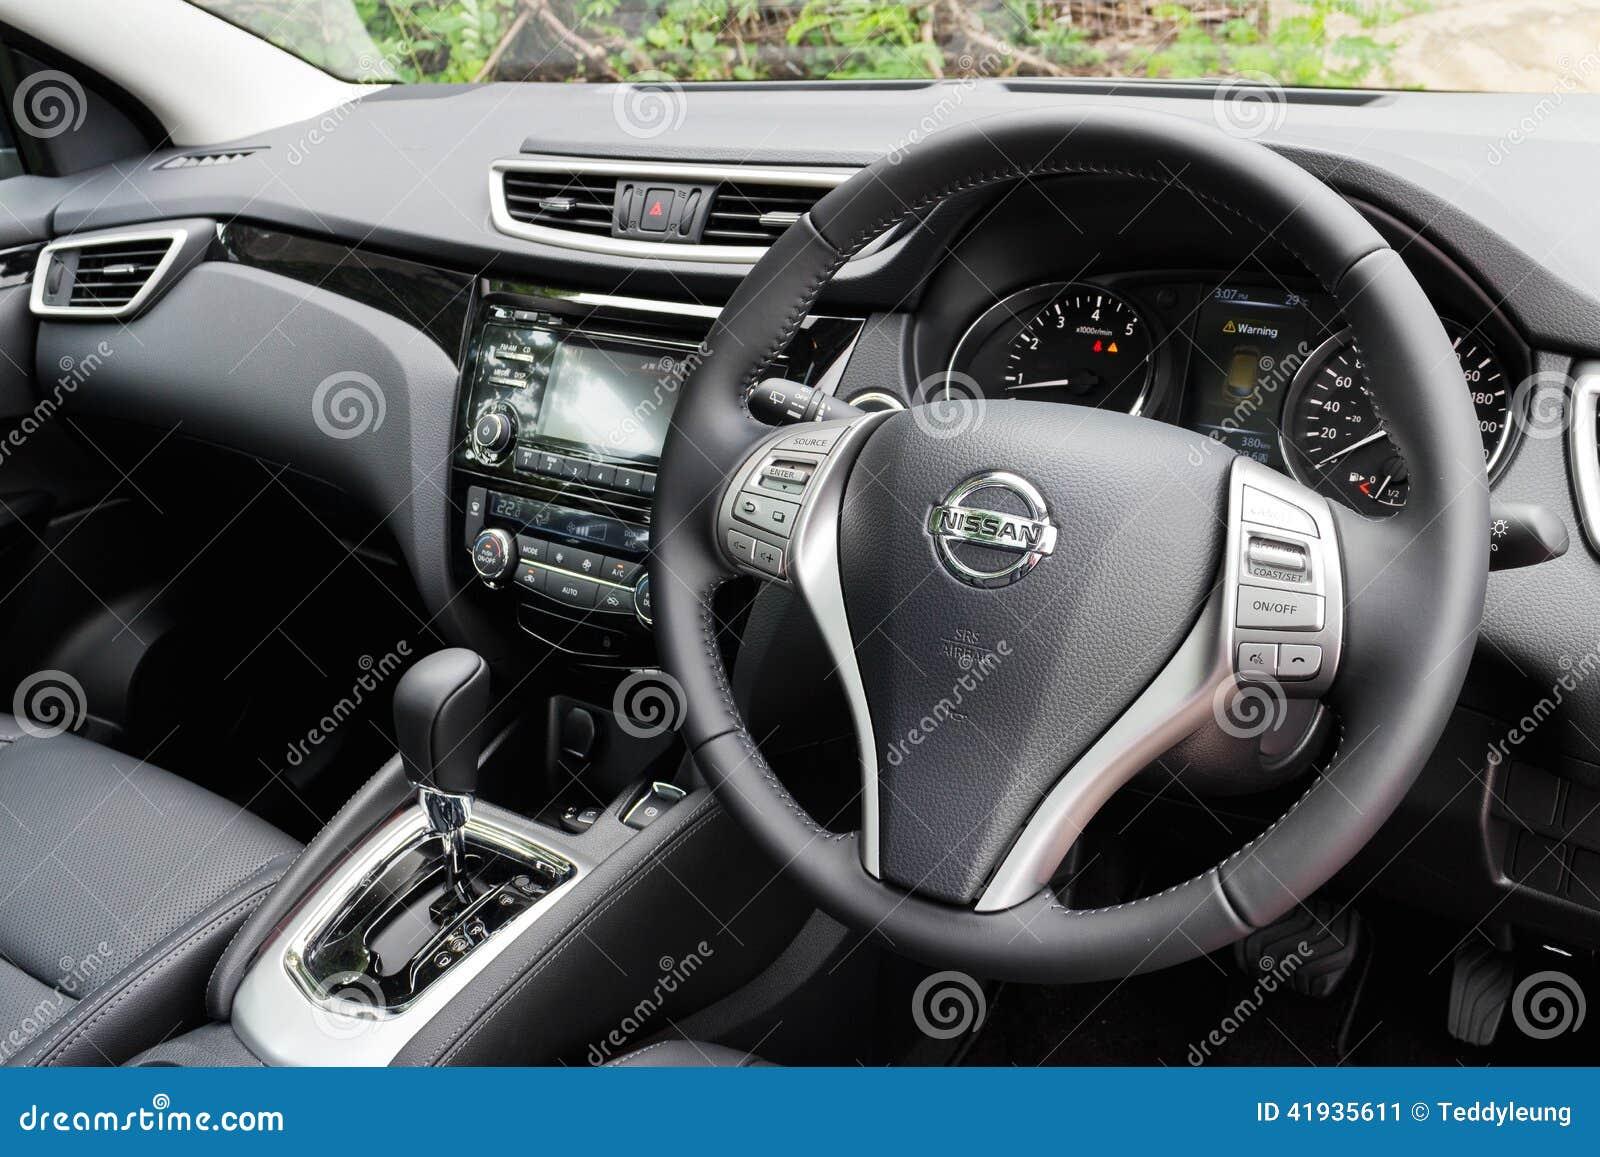 Nissan qashqai interior 2014 model editorial photo image for Interior nissan qashqai 2014